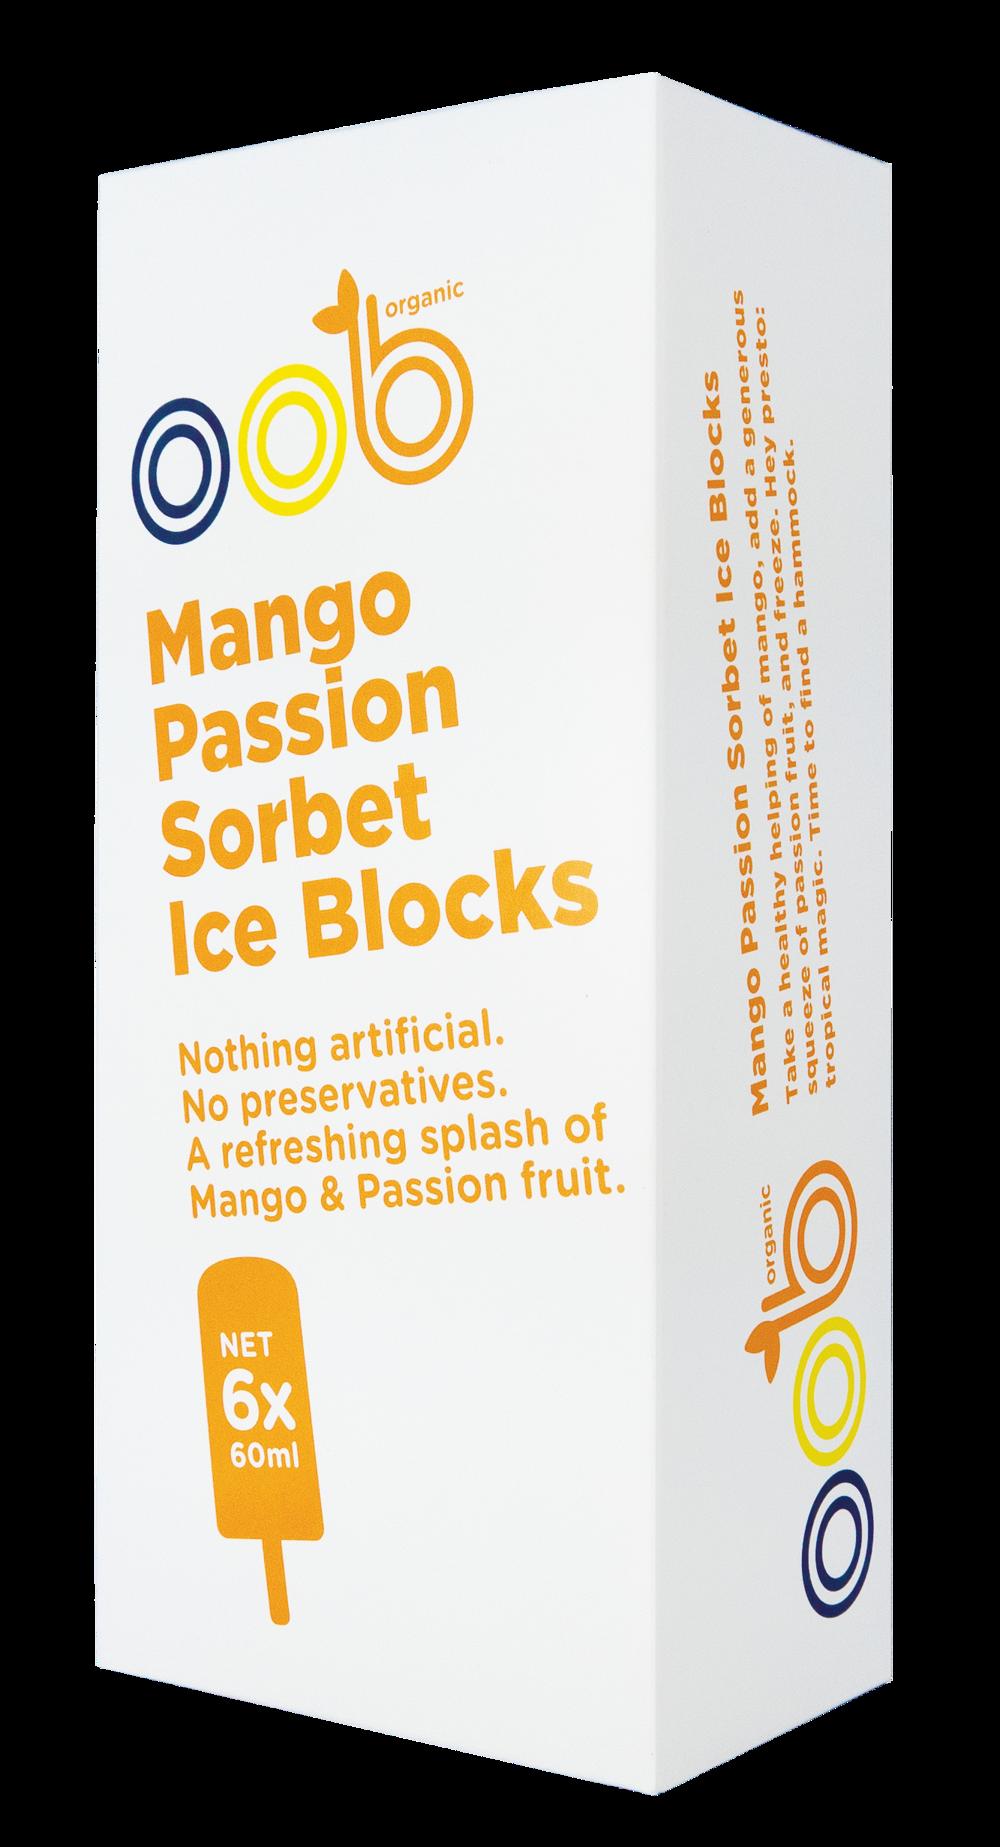 Mango Passion